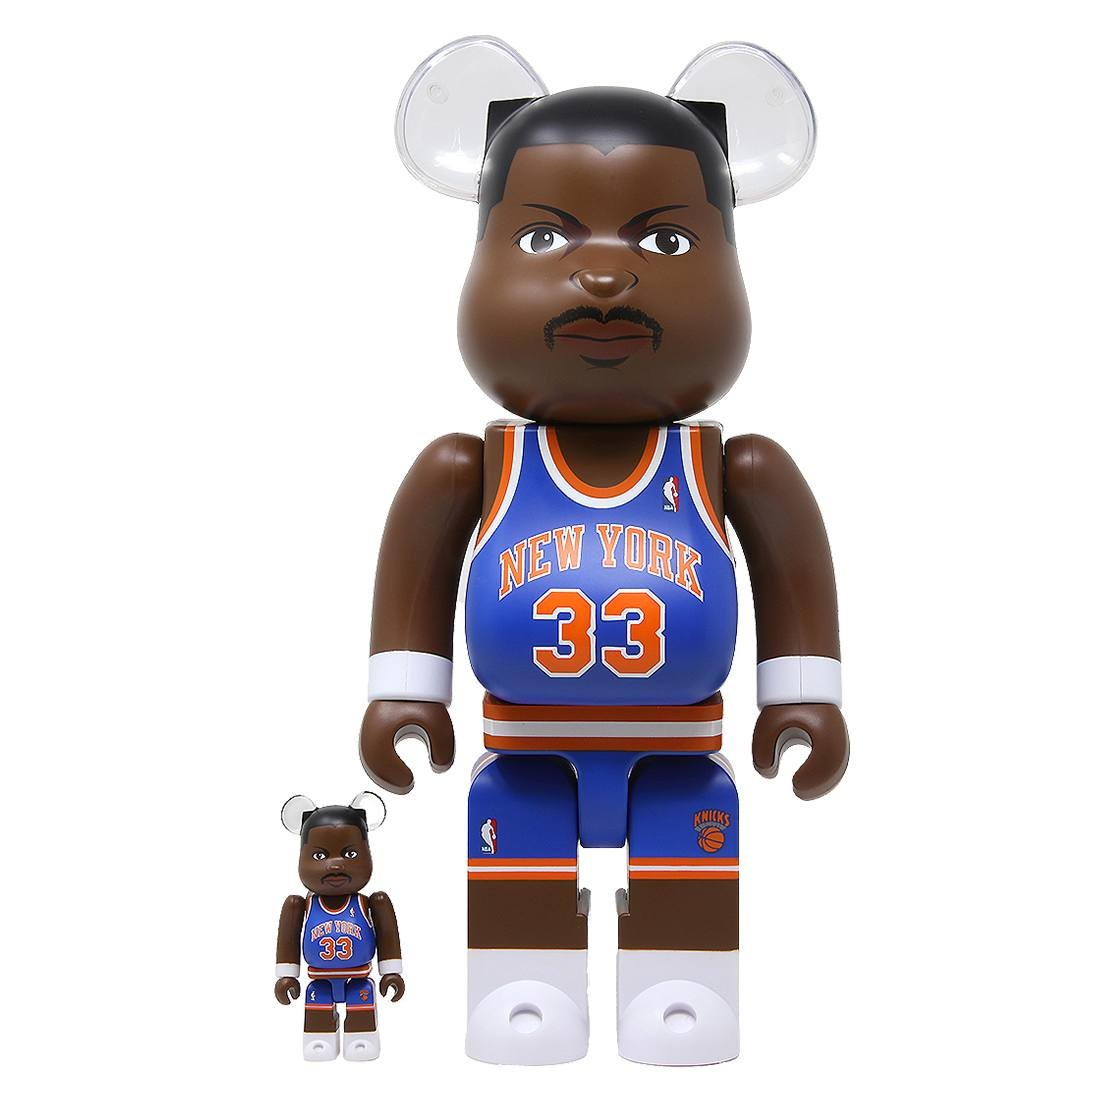 Medicom NBA New York Knicks Patrick Ewing 100% 400% Bearbrick Figure (blue)